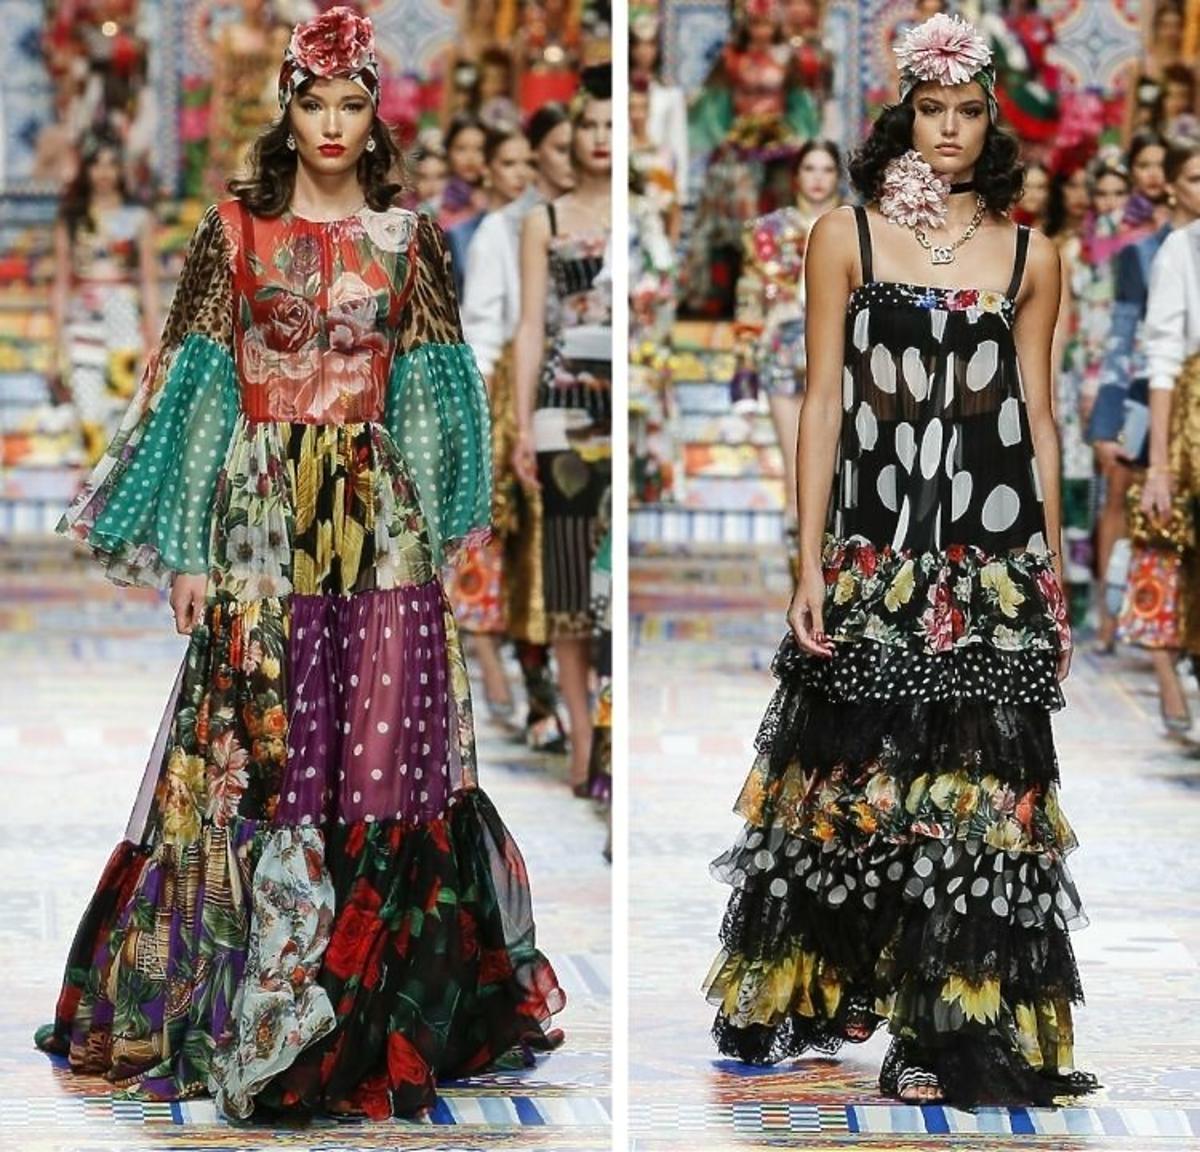 Dolce&Gabbana wiosna/lato 2021